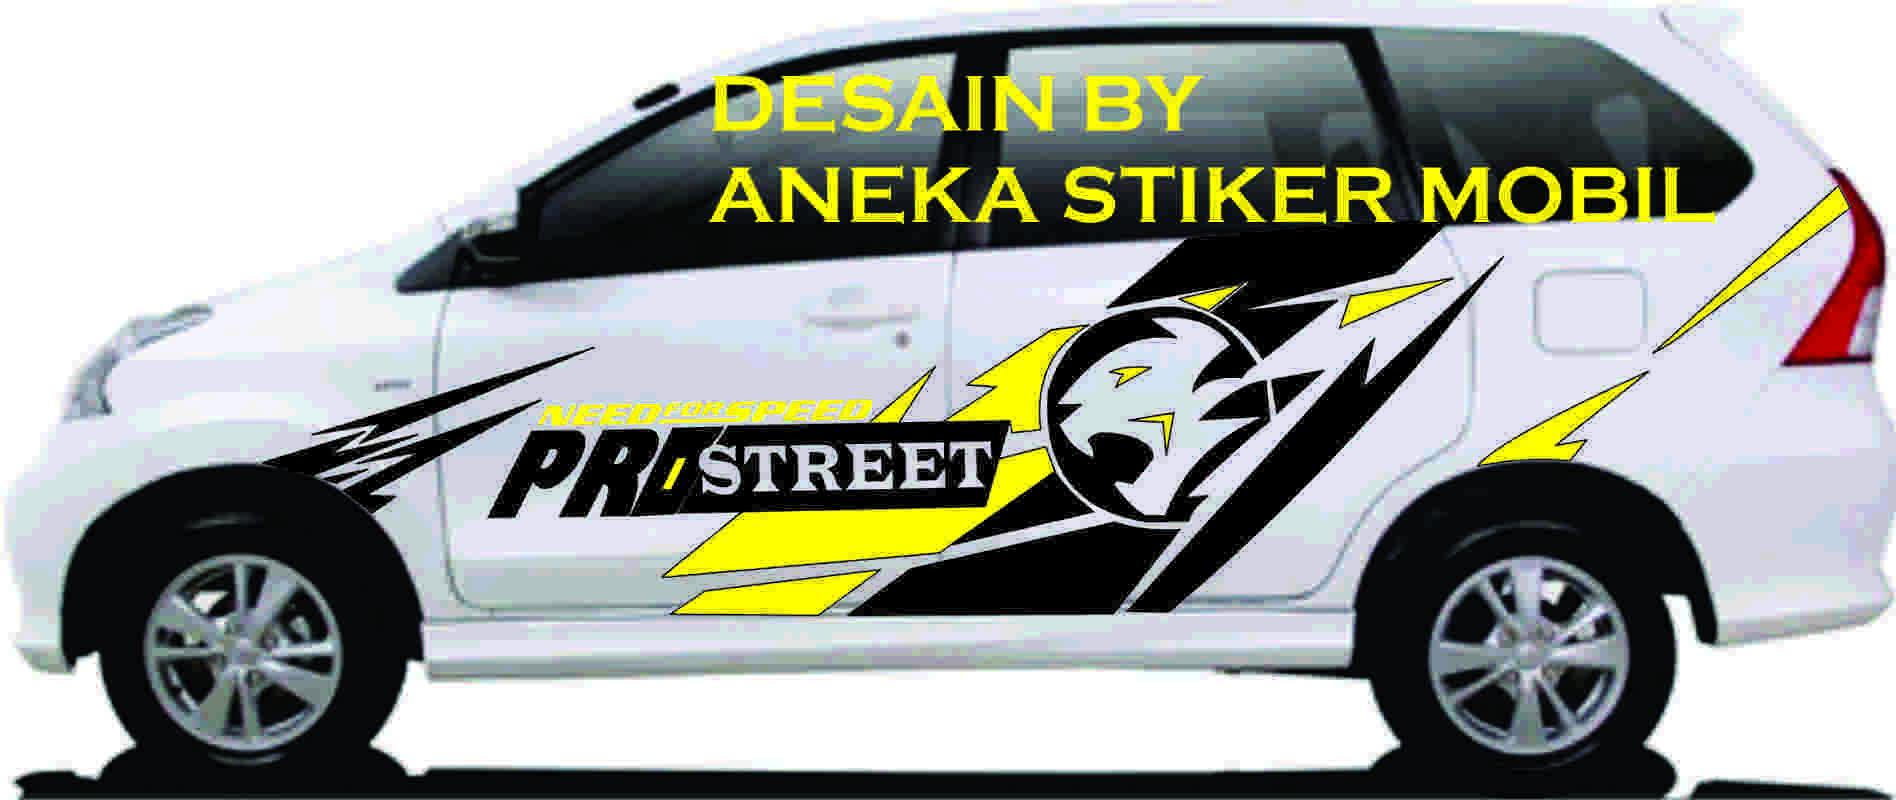 Jual Stiker Mobil Avanza Terbaru Promo Stiker Mbil Avanza Xenia Terlaris Striping Cutting Macan Terbaru Juli 2021 Blibli